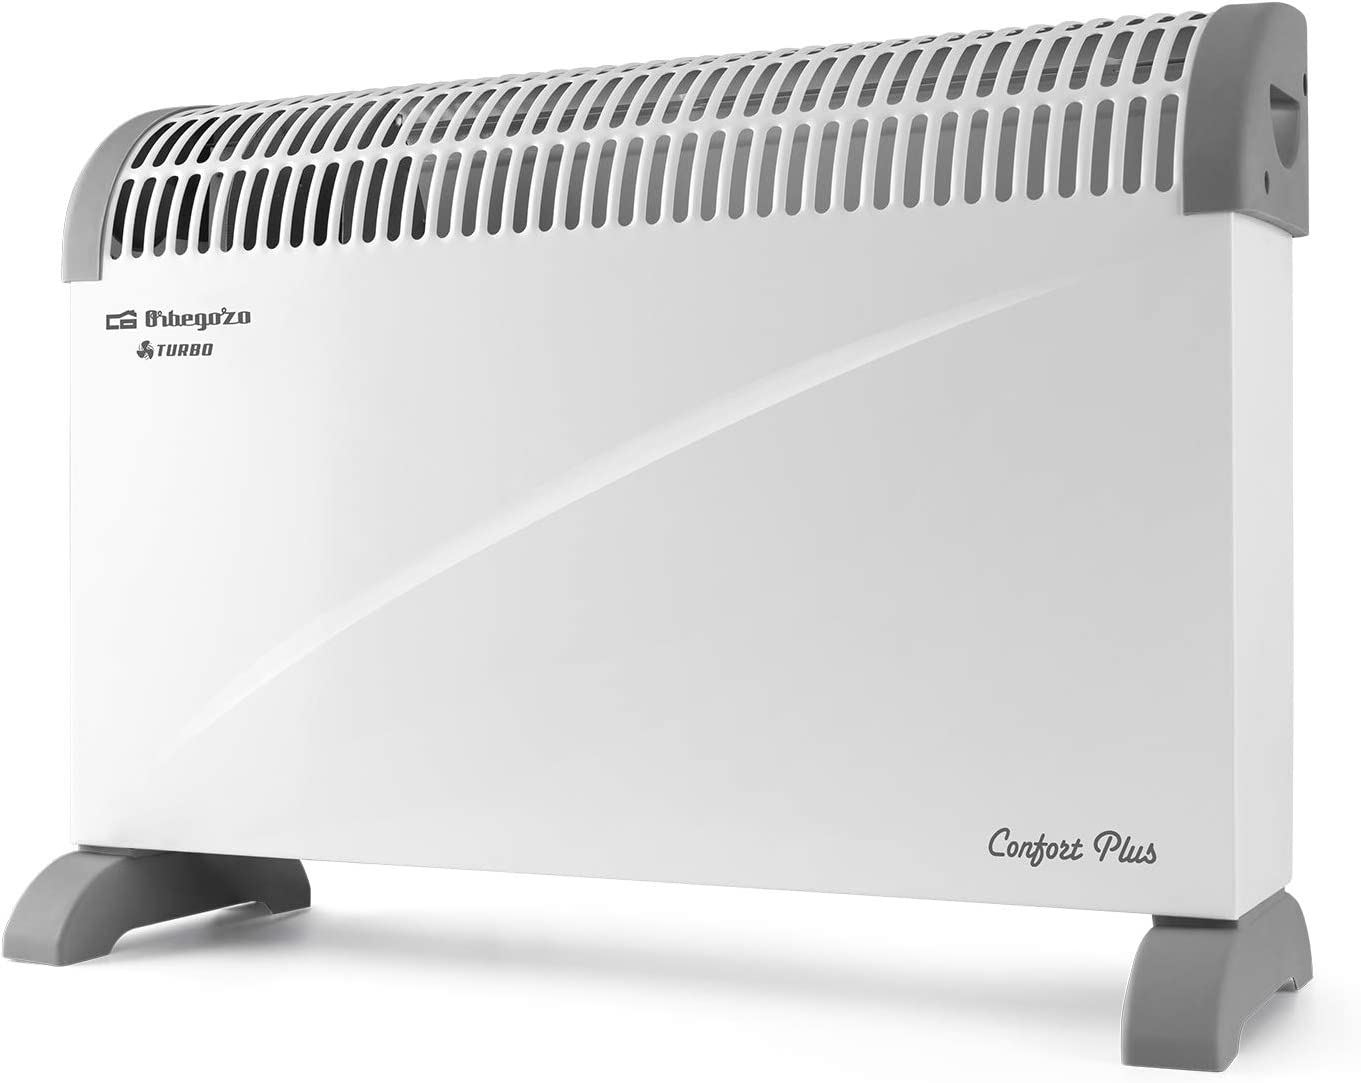 Orbegozo CVT 3400 Convector, Termostato Regulable, Función Turbo, Protección Contra Sobrecalentamiento, Asas de Transporte, 2000 W, Blanco